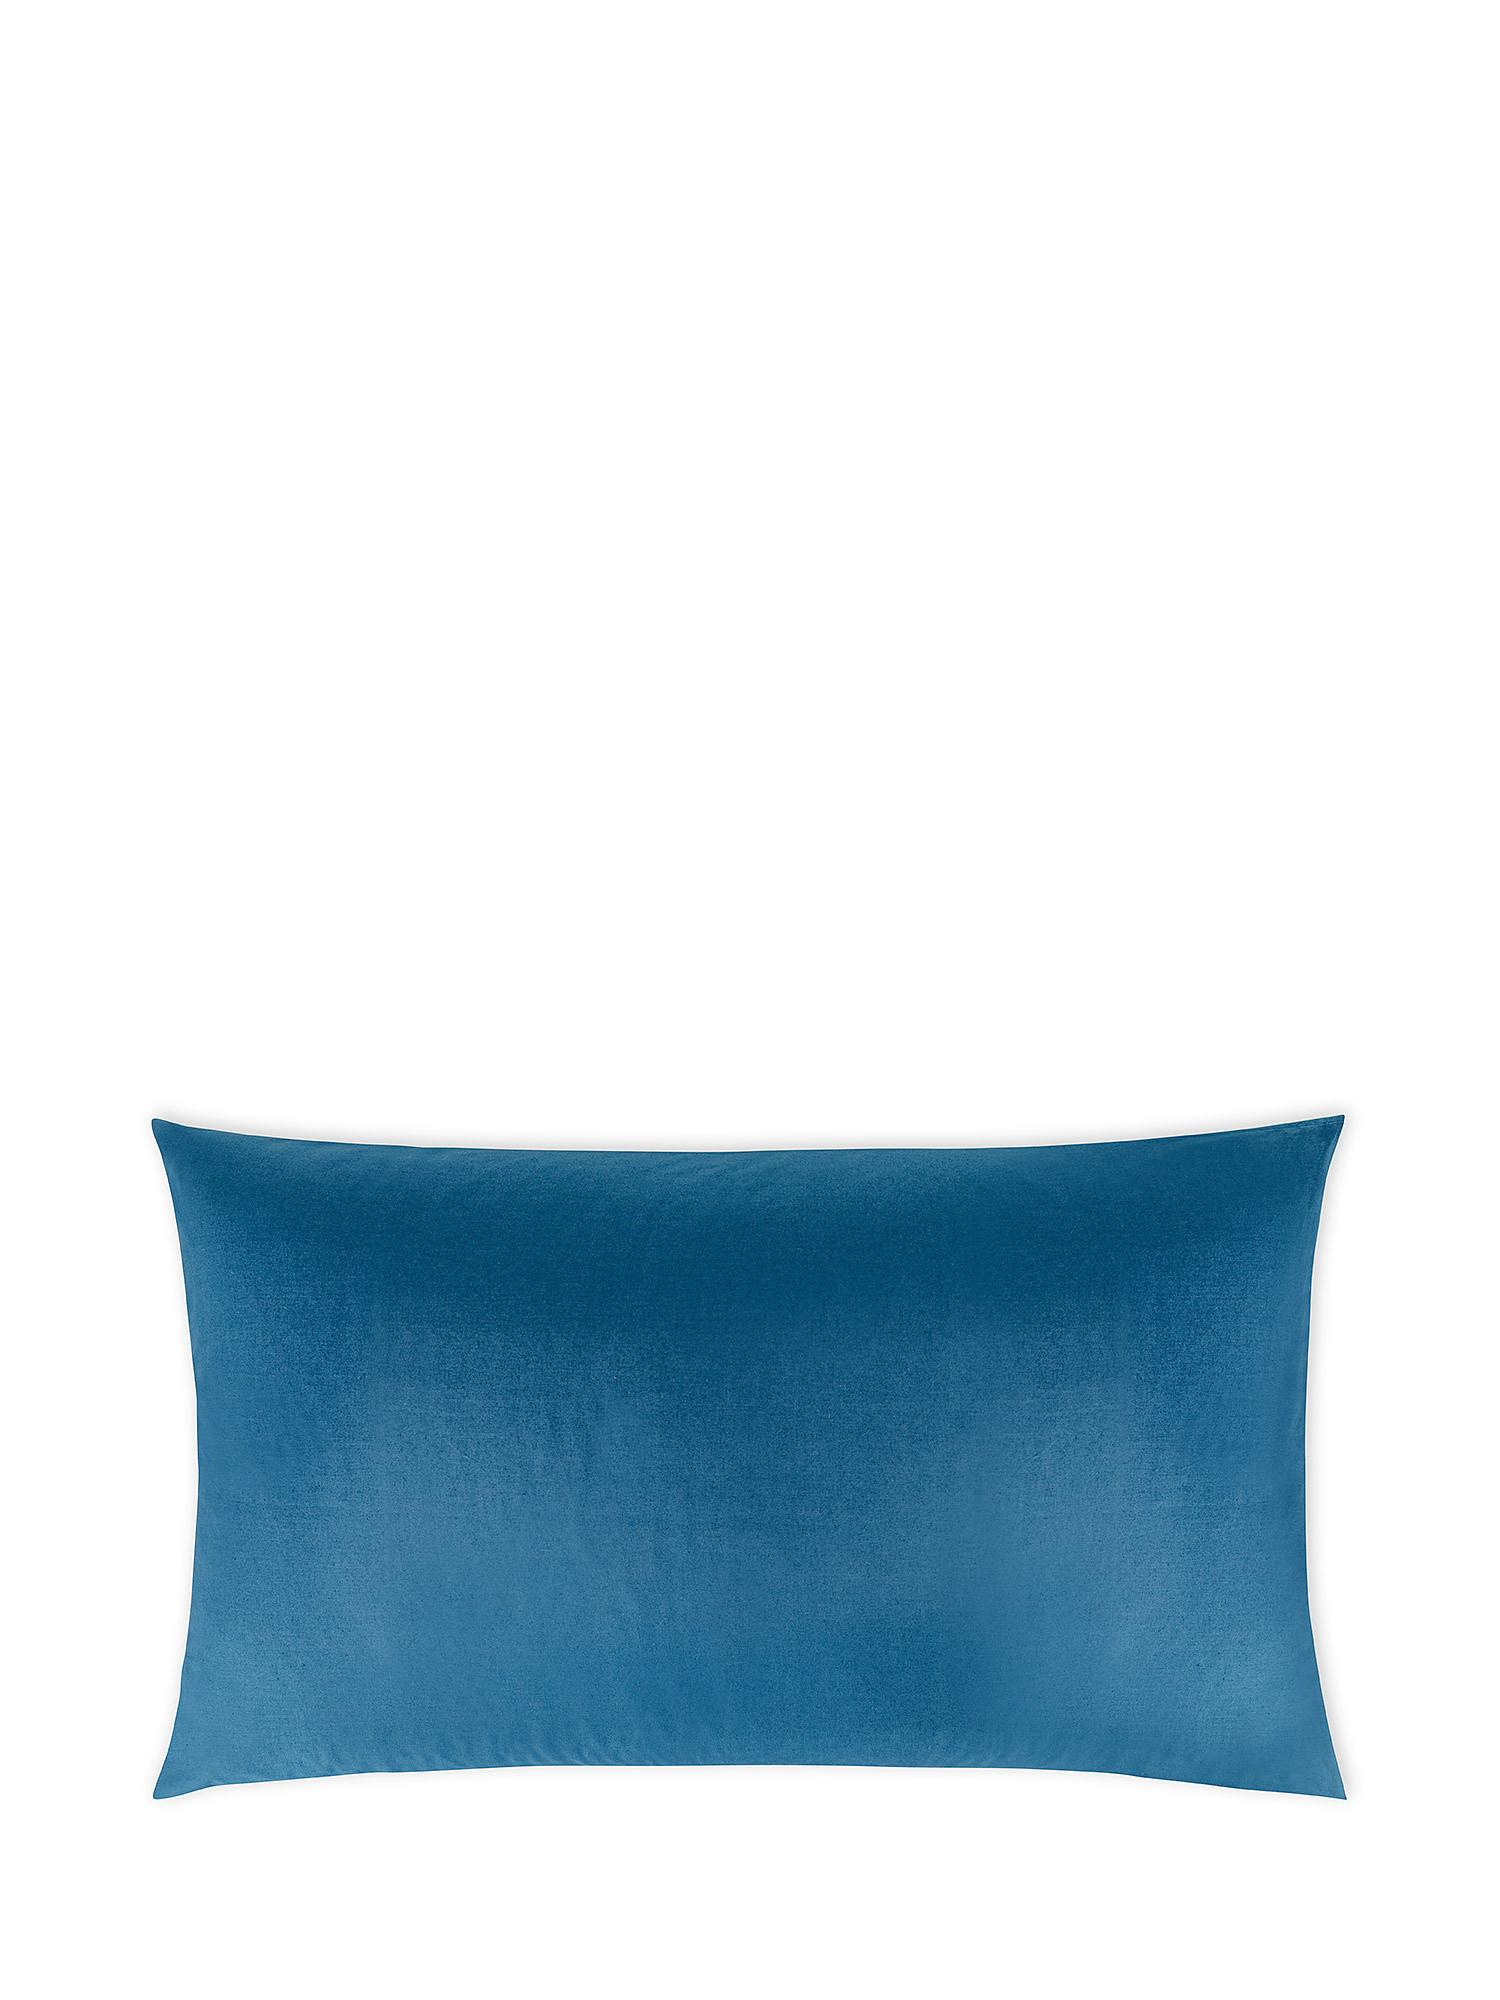 Federa puro cotone tinta unita, Blu, large image number 0